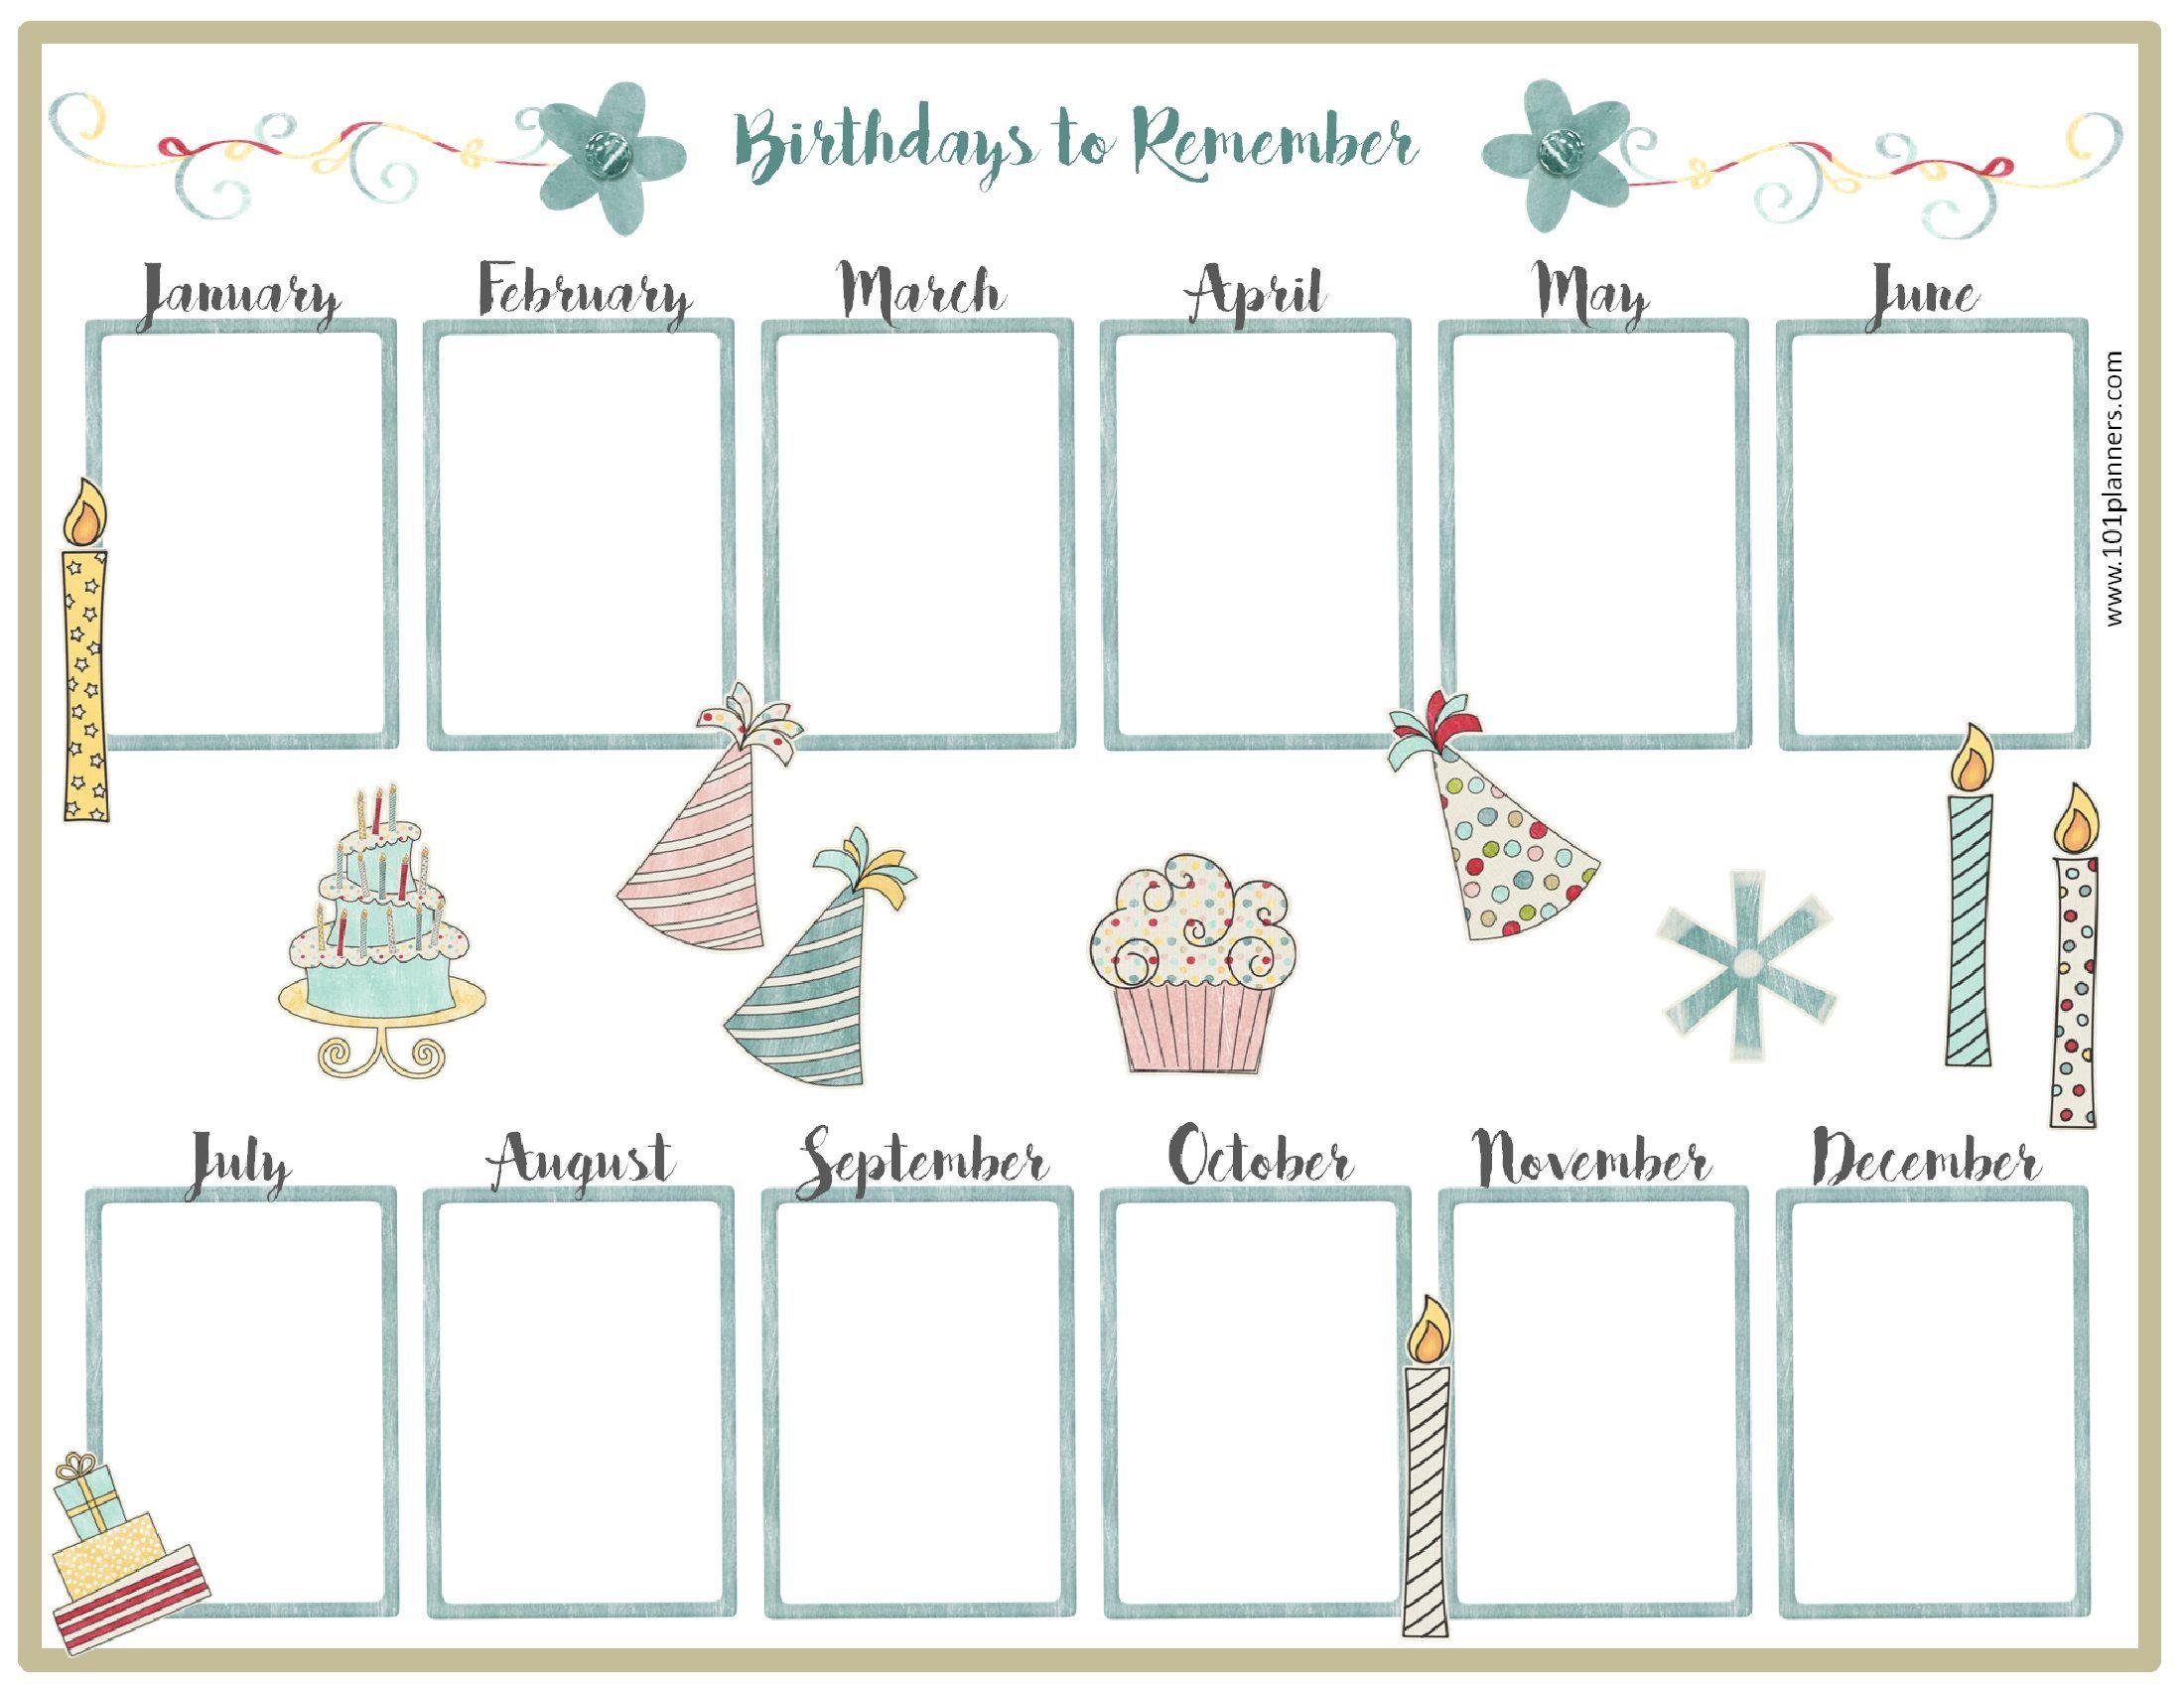 Free Birthday Calendar   Birthday Calendar   Pinterest   Birthday - Free Printable Birthday Graph